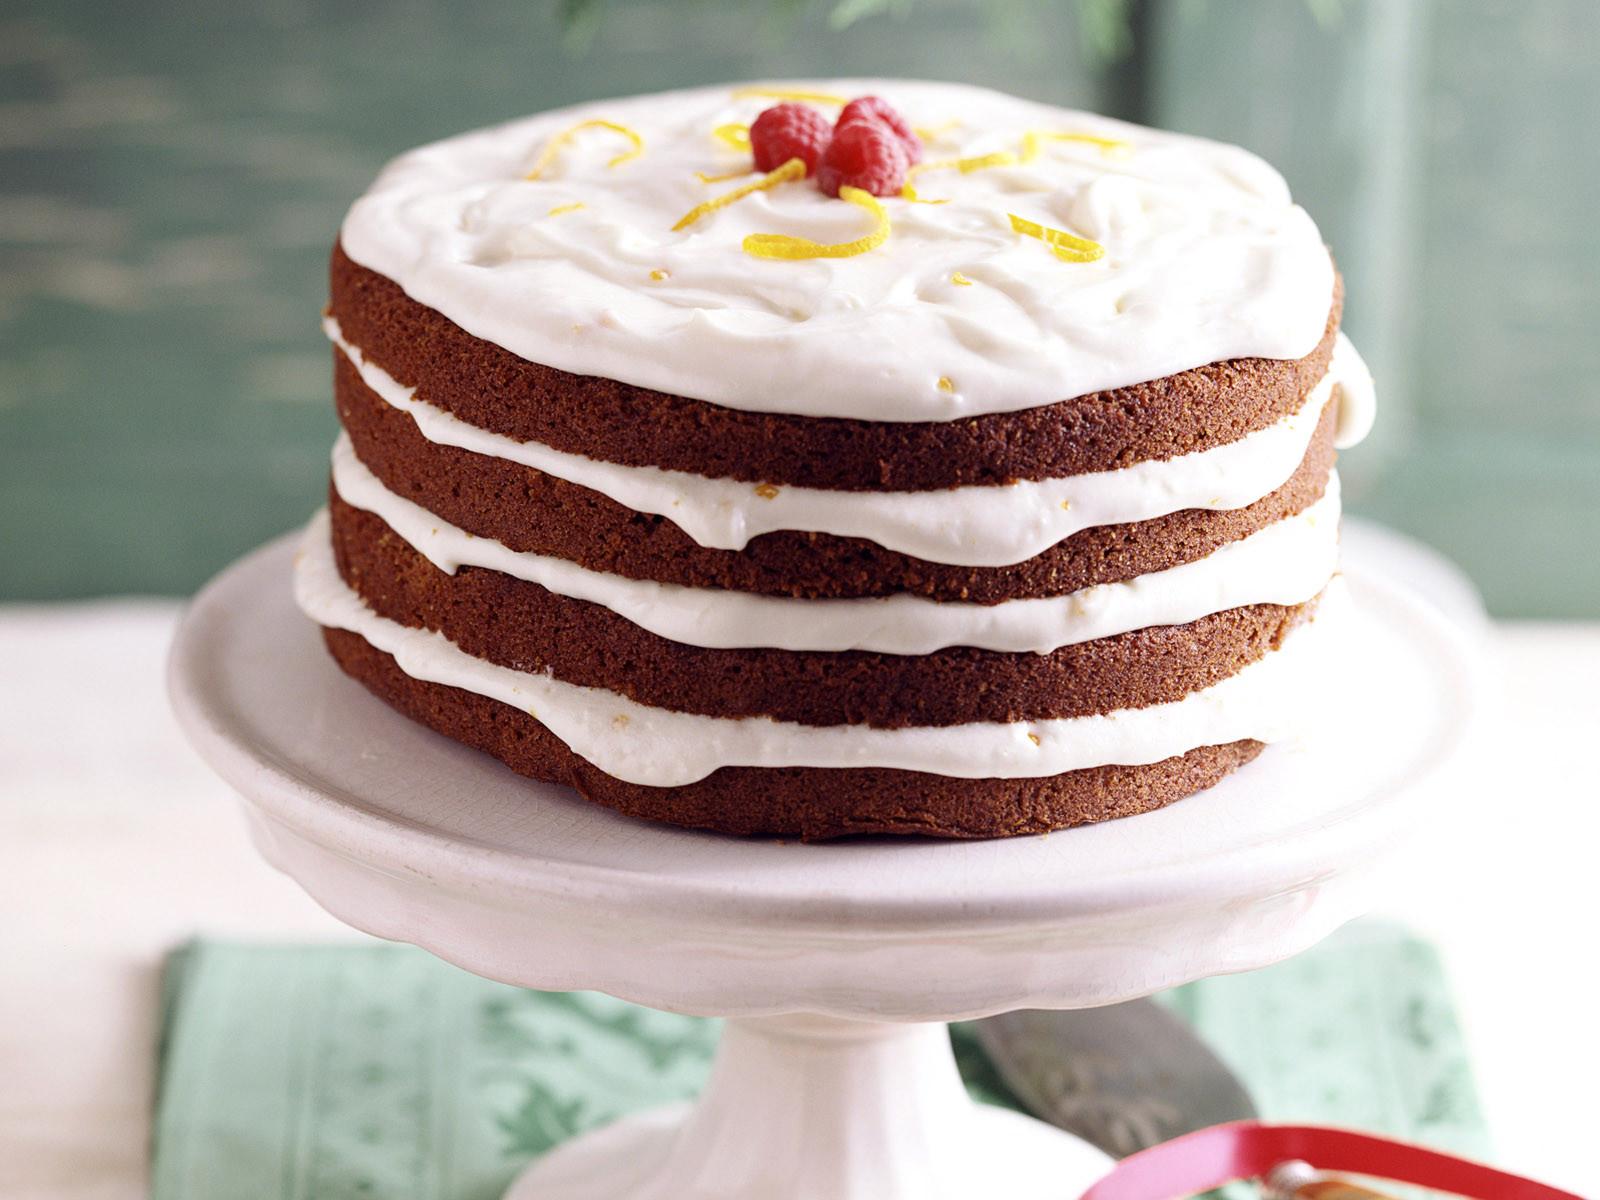 http://2.bp.blogspot.com/_Ym3du2sG3R4/TOIygNpJNTI/AAAAAAAAC88/ogHGDTIWkeM/s1600/Delicious-Cake-wallpaper.jpg